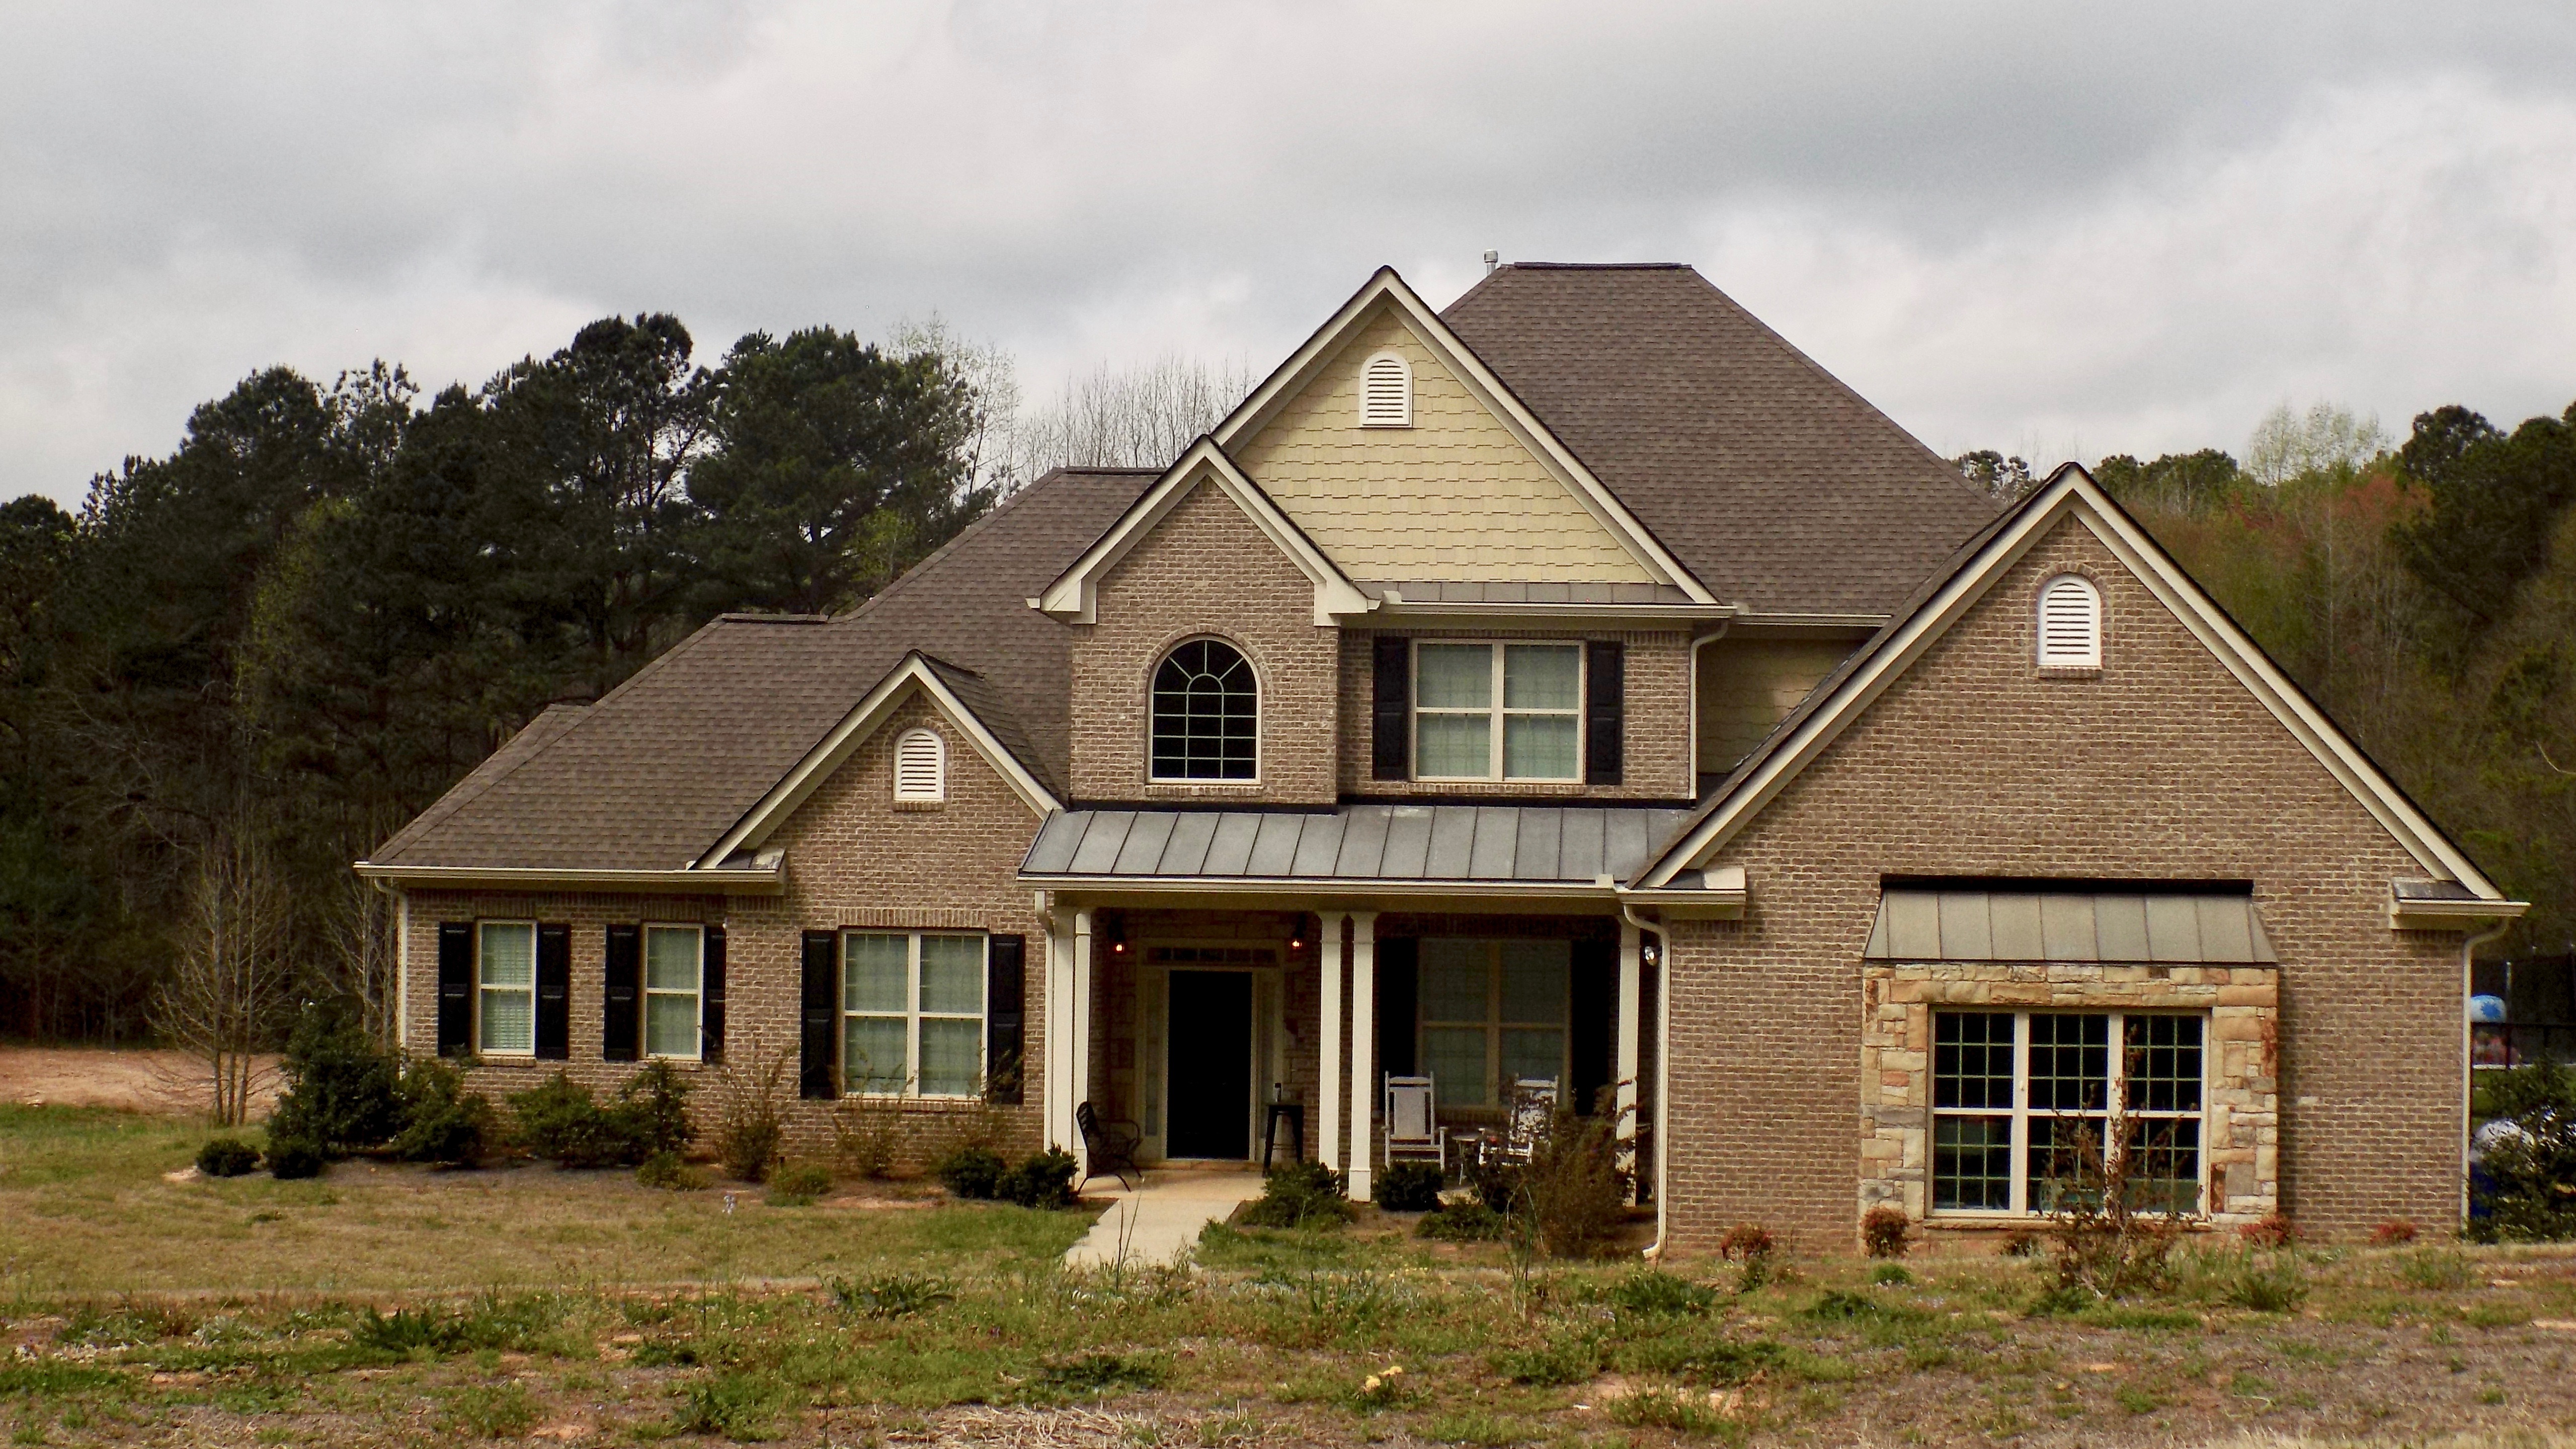 Photo of 125 Trustin Lake Drive, Fayetteville, GA, 30214